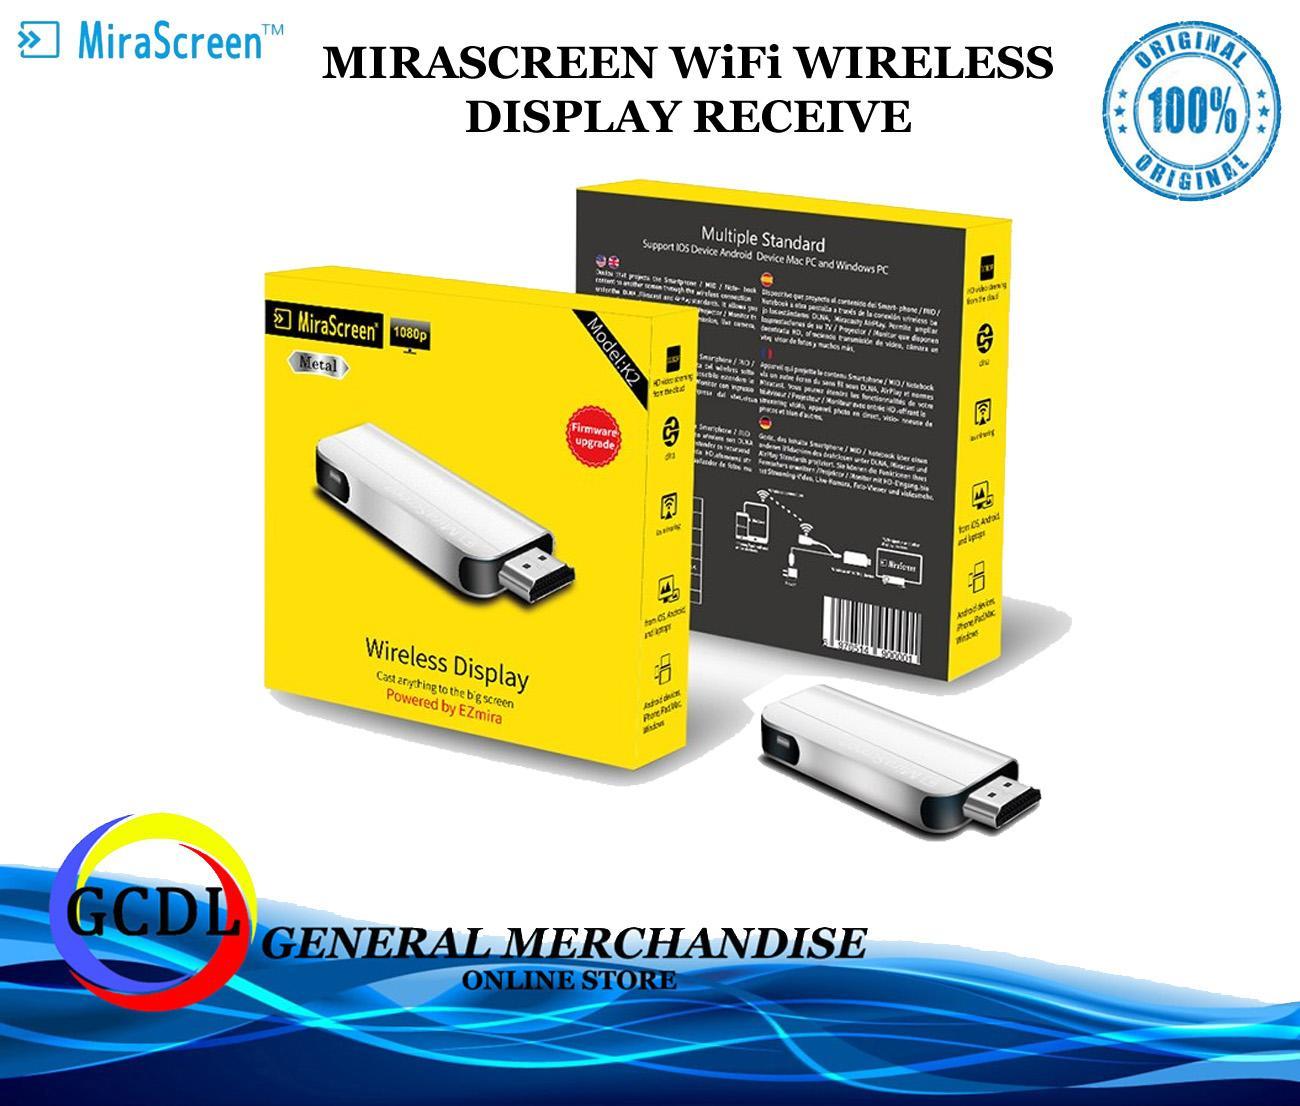 MiraScreen K2 Wireless TV Stick HDMI Dongle Display Receiver